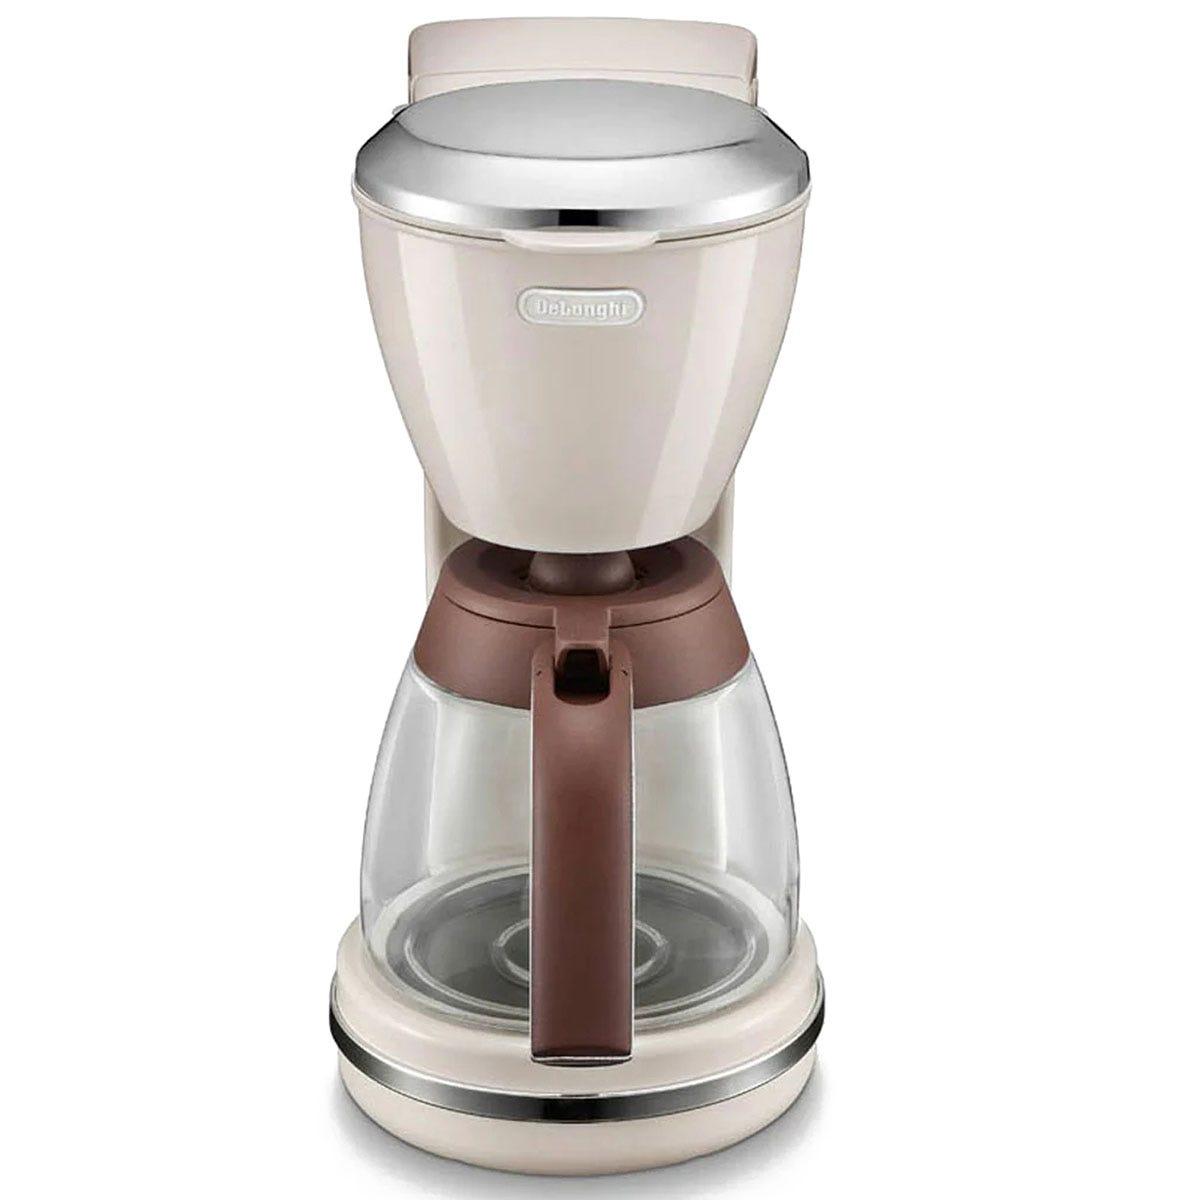 De'Longhi DeLonghi ICMOV210BG Icona Vintage Drip 1.25L 1000W Coffee Machine - Beige